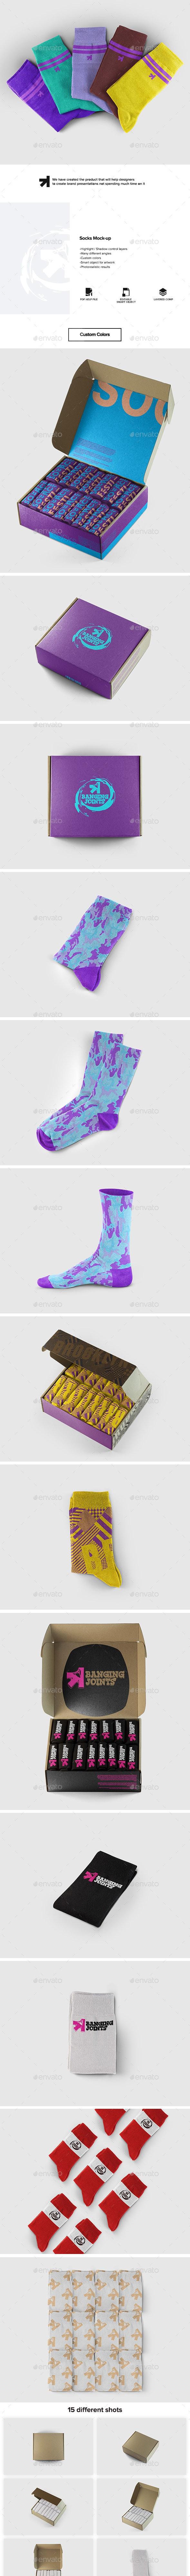 Socks Set Mockup - Miscellaneous Apparel